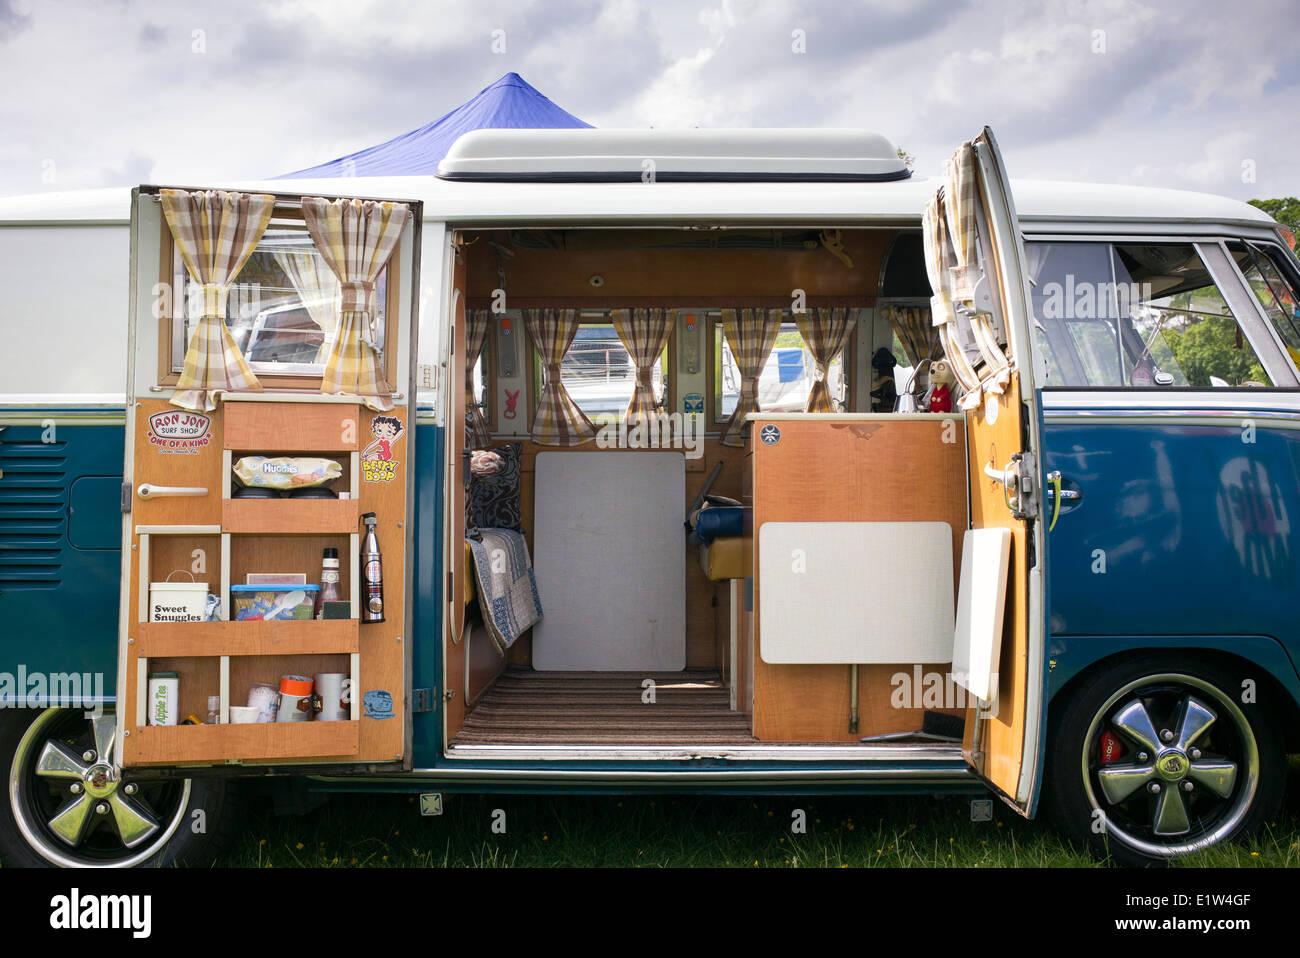 Interesting Vw Split Screen Volkswagen Camper Van Interior At A Show England With